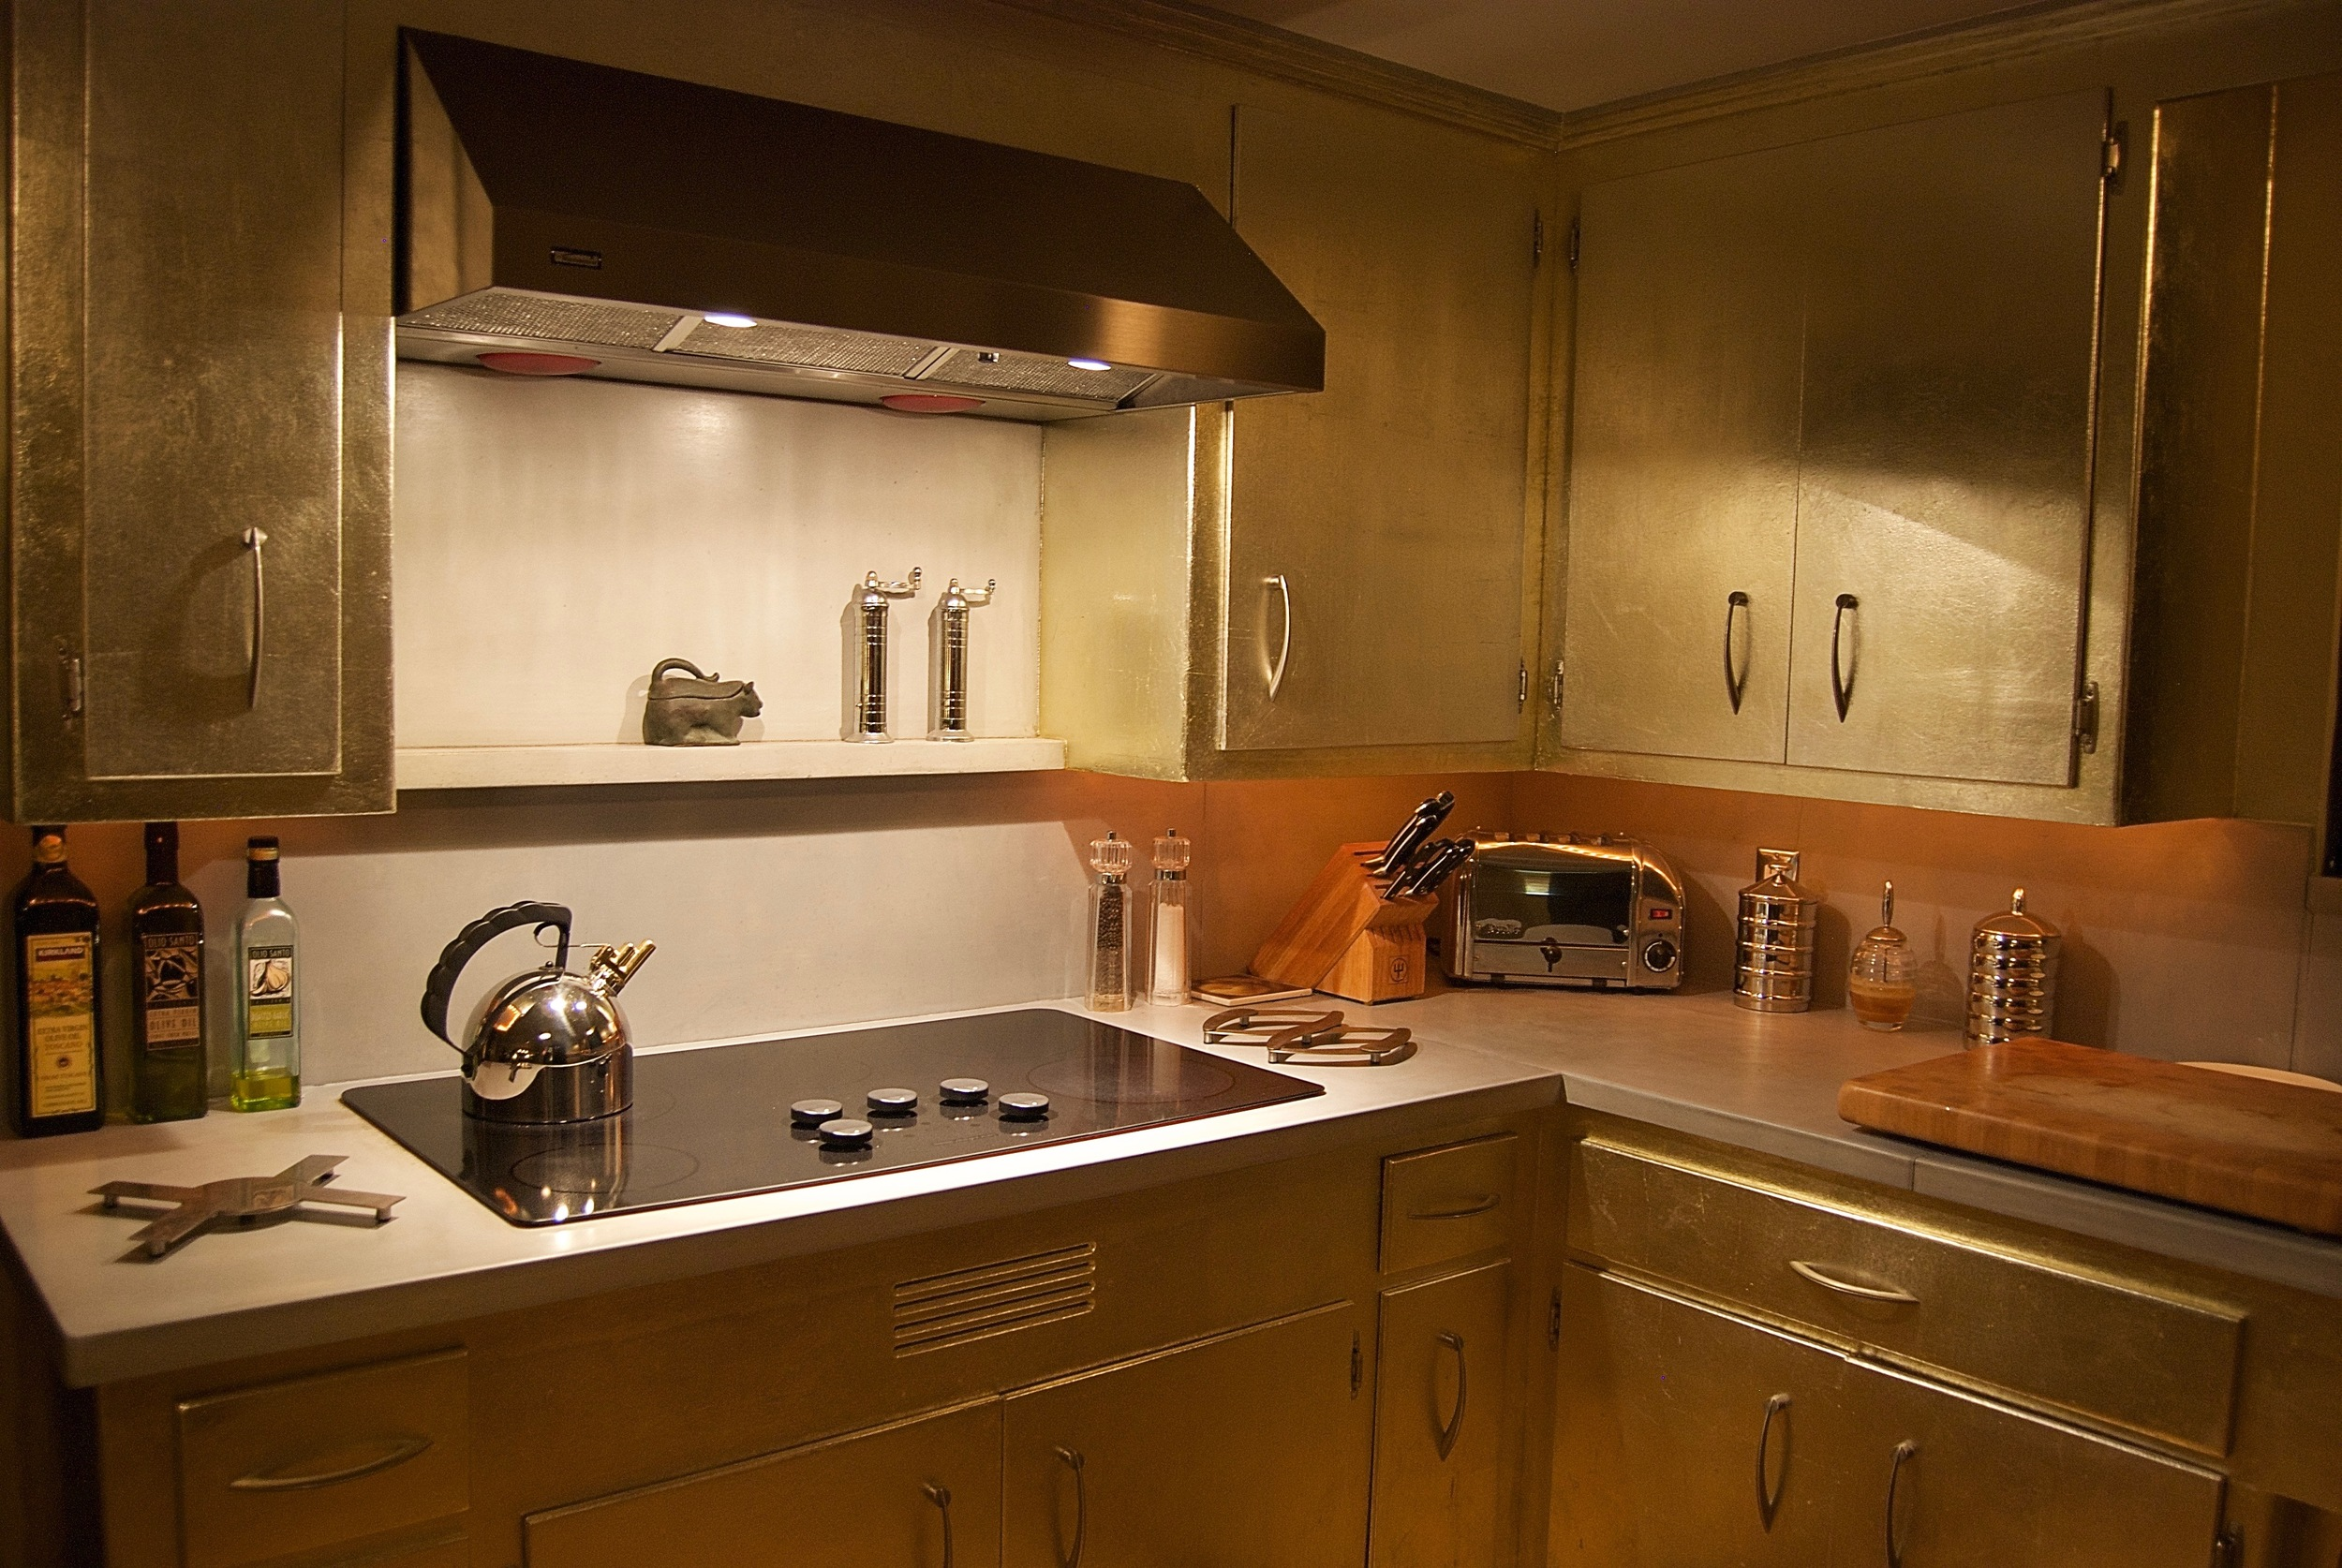 Coffin & King Custom Furniture/ Interiors - Aluminum Leafed Original '50s Cabinets, Cast Concrete Countertops, Cast Concrete Backsplash